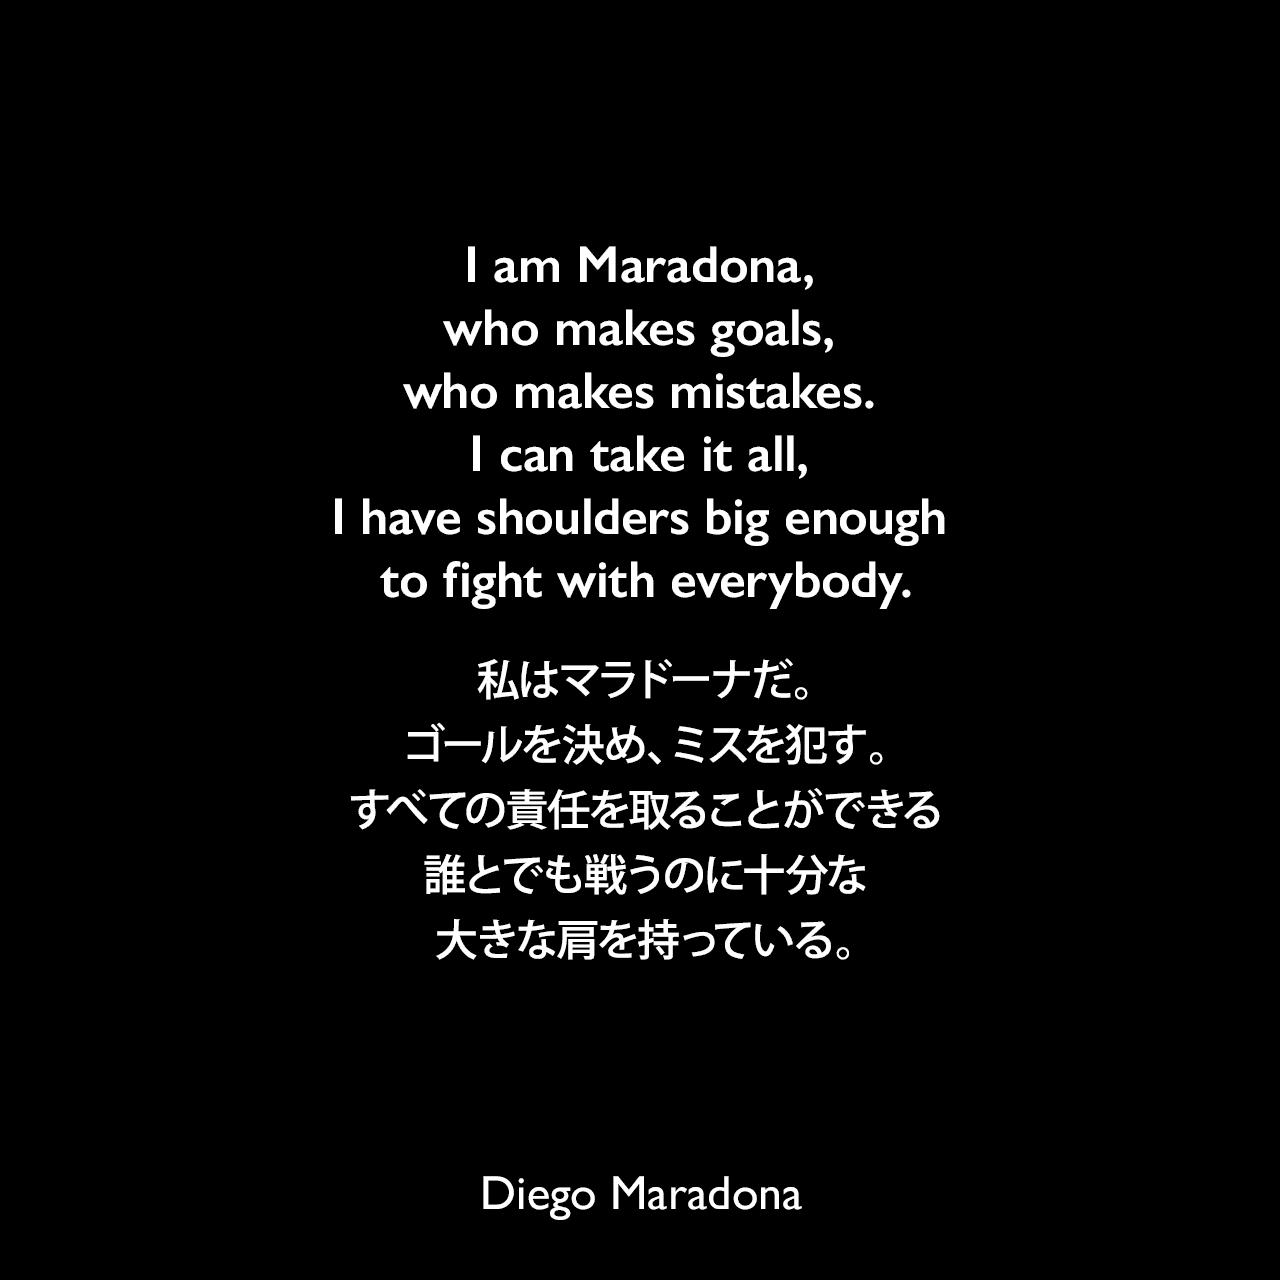 I am Maradona, who makes goals, who makes mistakes. I can take it all, I have shoulders big enough to fight with everybody.私はマラドーナだ。ゴールを決め、ミスを犯す。すべての責任を取ることができる、誰とでも戦うのに十分な大きな肩を持っている。Diego Maradona